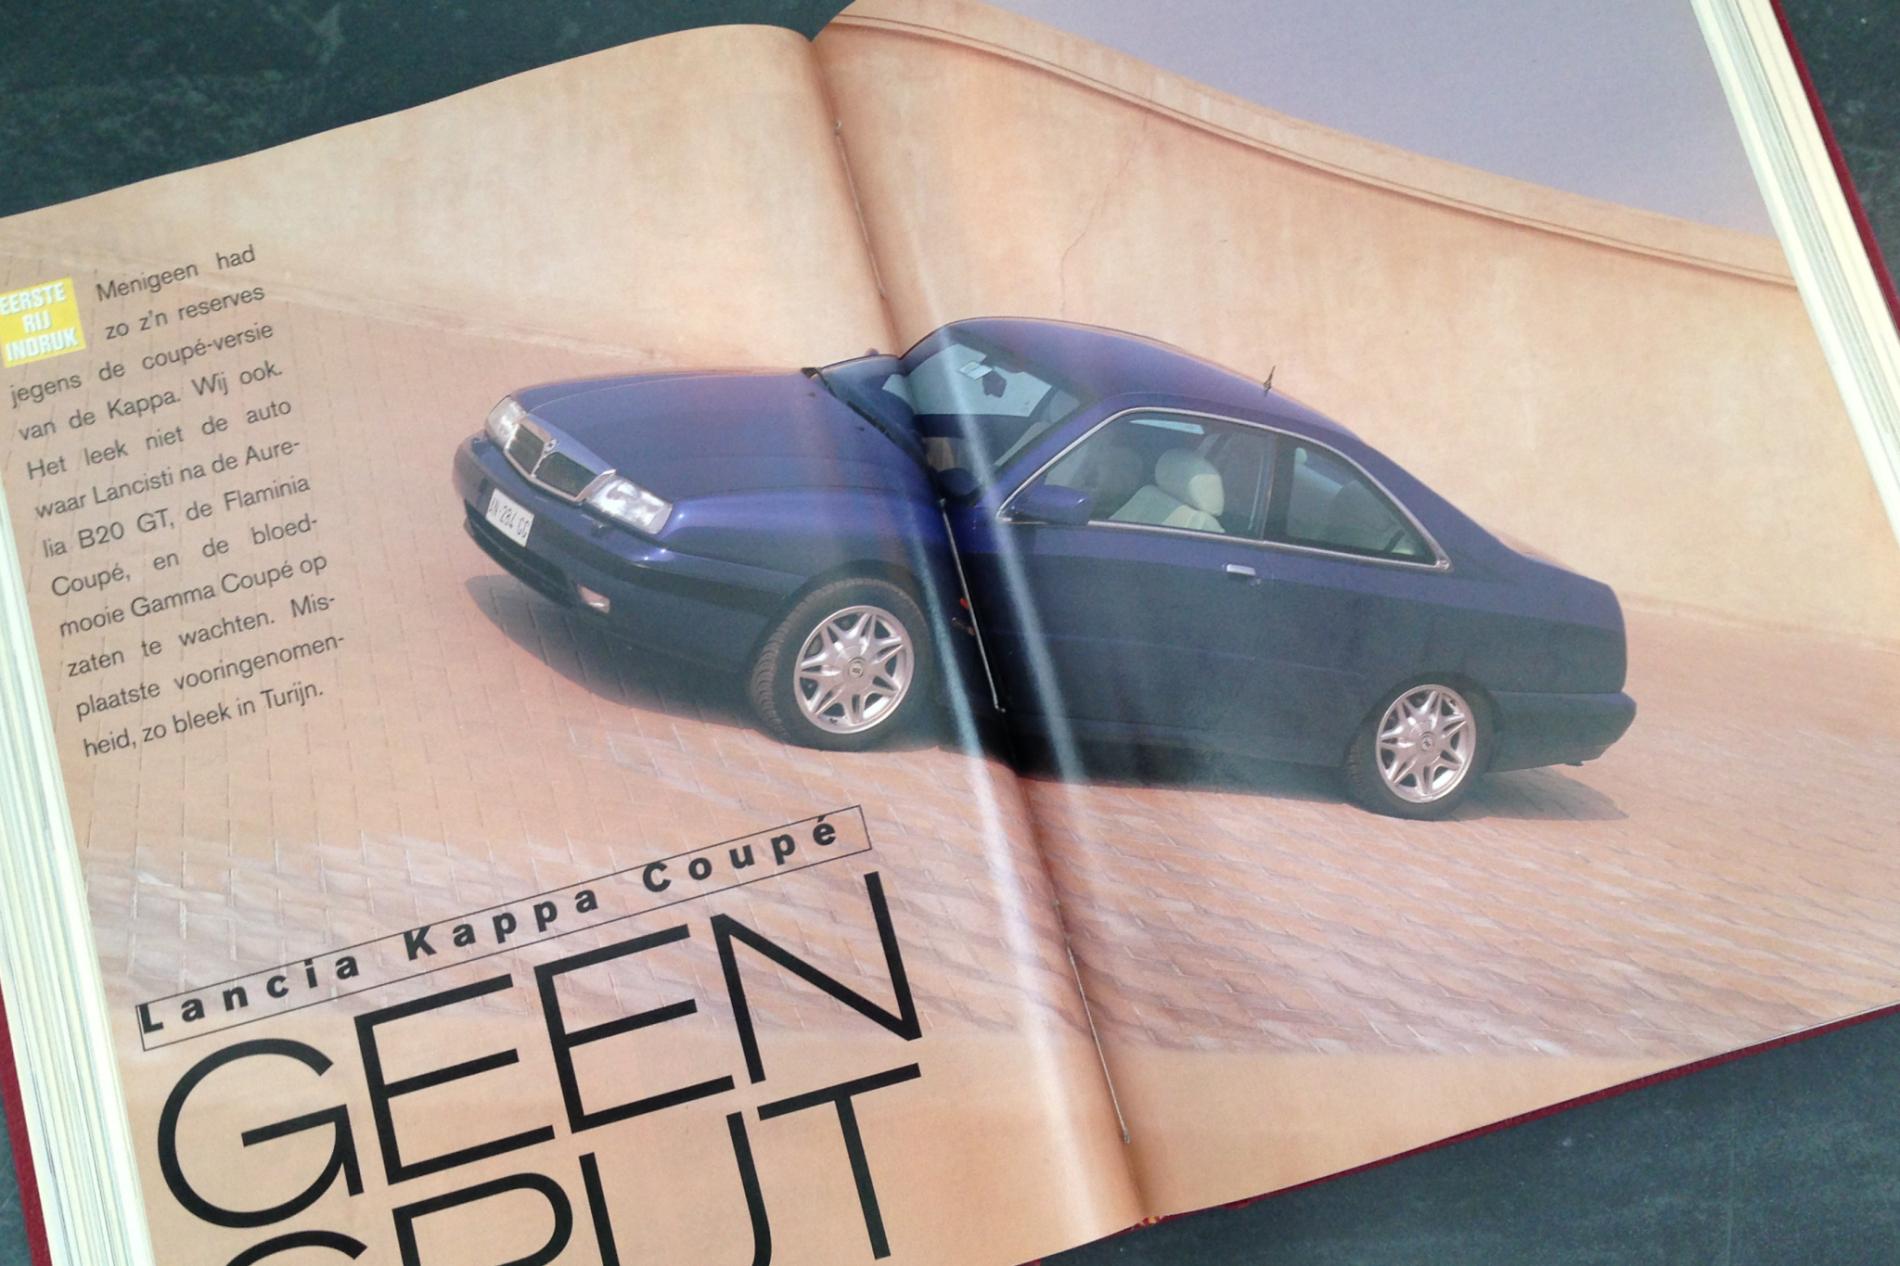 Rij-indruk Lancia Kappa Coupé, Autovisie 8, 1997